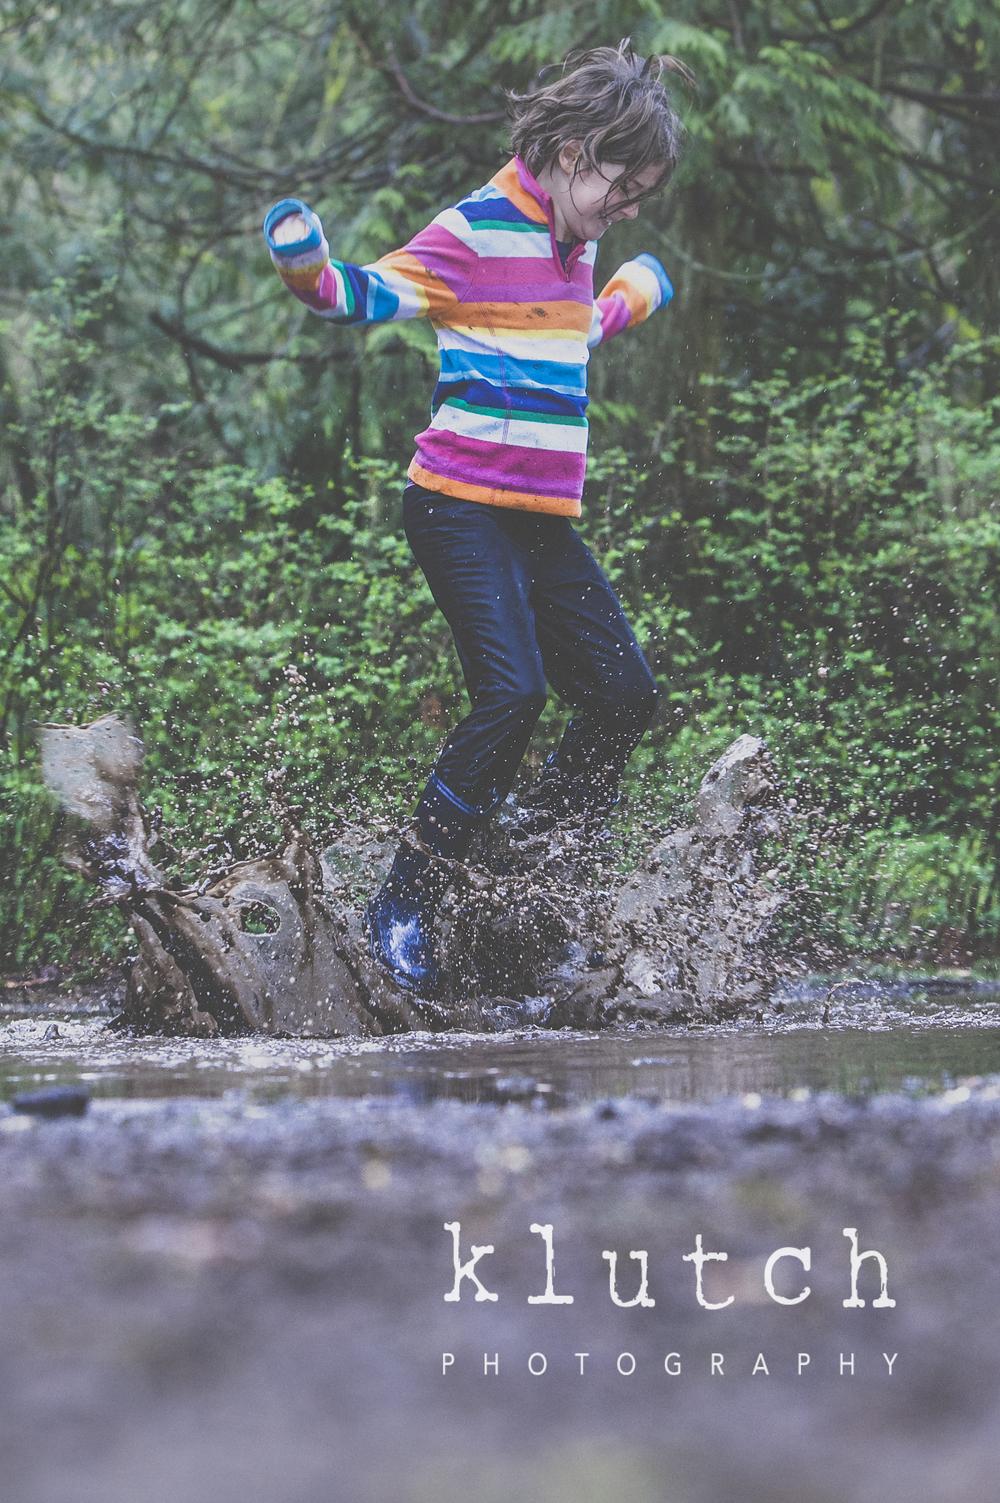 Klutch Photography,white rock family photographer, vancouver family photographer, whiterock lifestyle photographer, life unscripted photographer, life unscripted session, photography,Dina Ferreira Stoddard-2-5.jpg